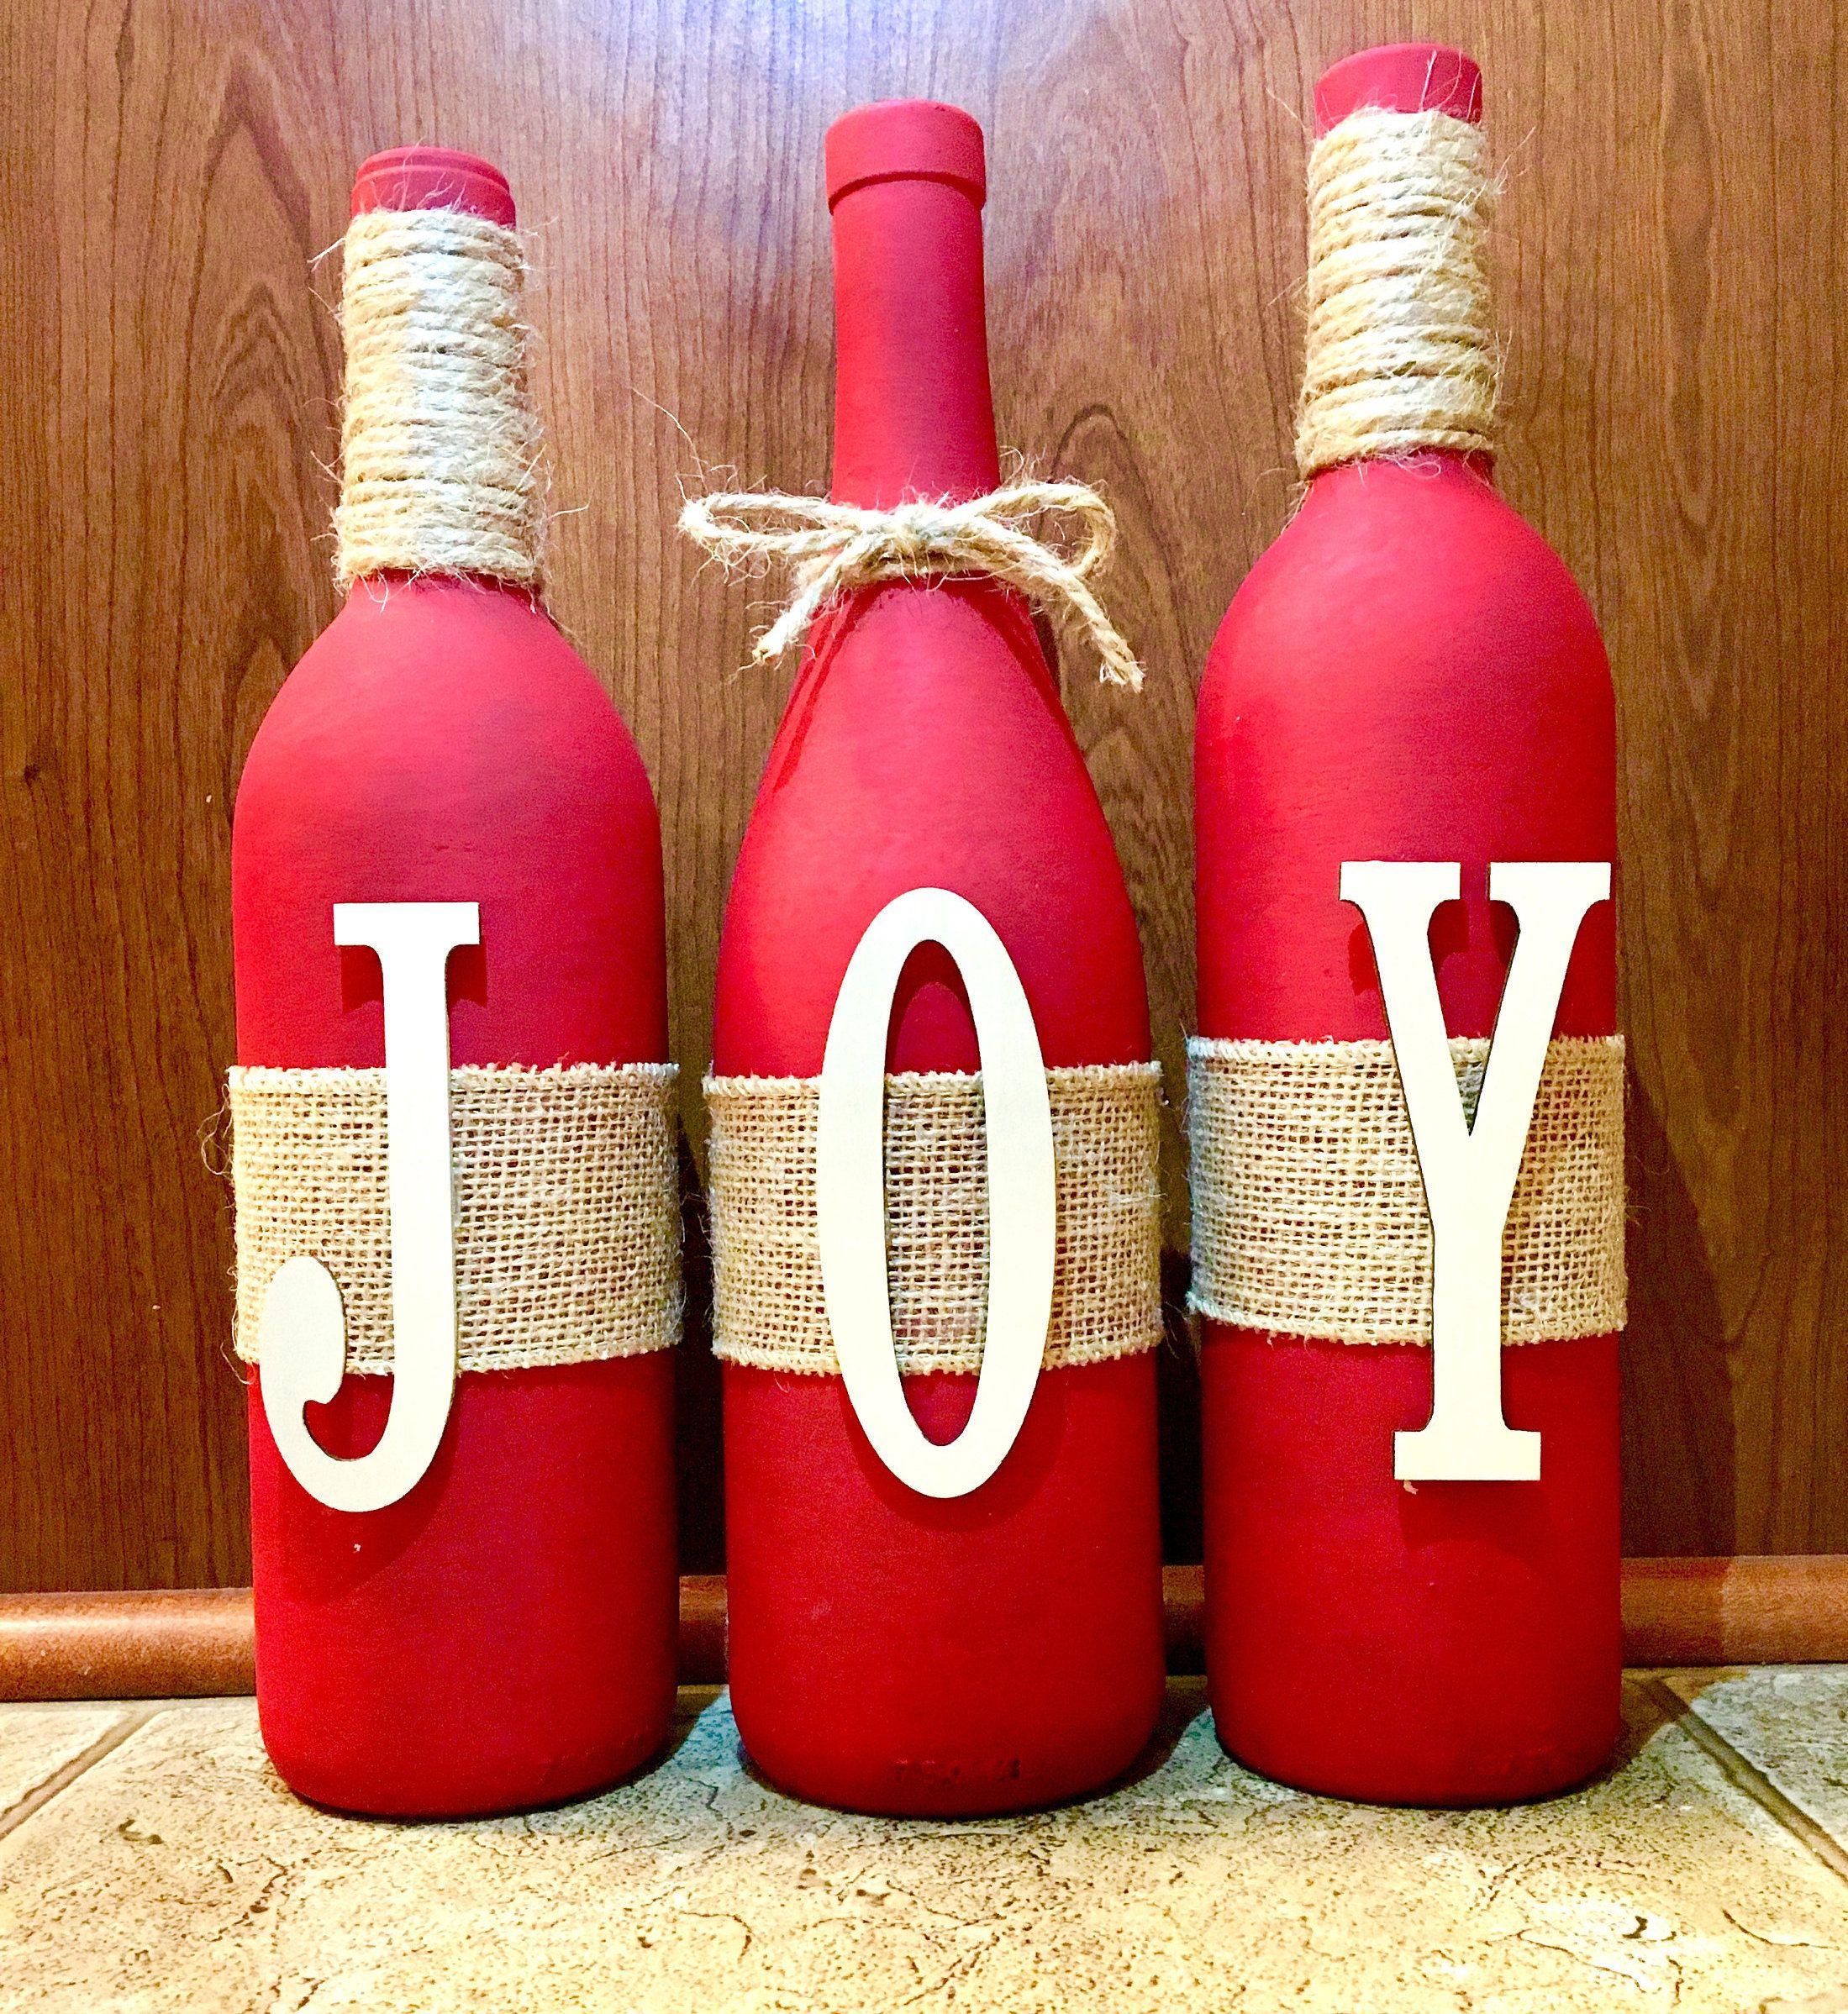 Joy Wine Bottle Set By Basekdesigns On Etsy Wine Bottle Crafts Christmas Christmas Wine Bottles Bottle Crafts